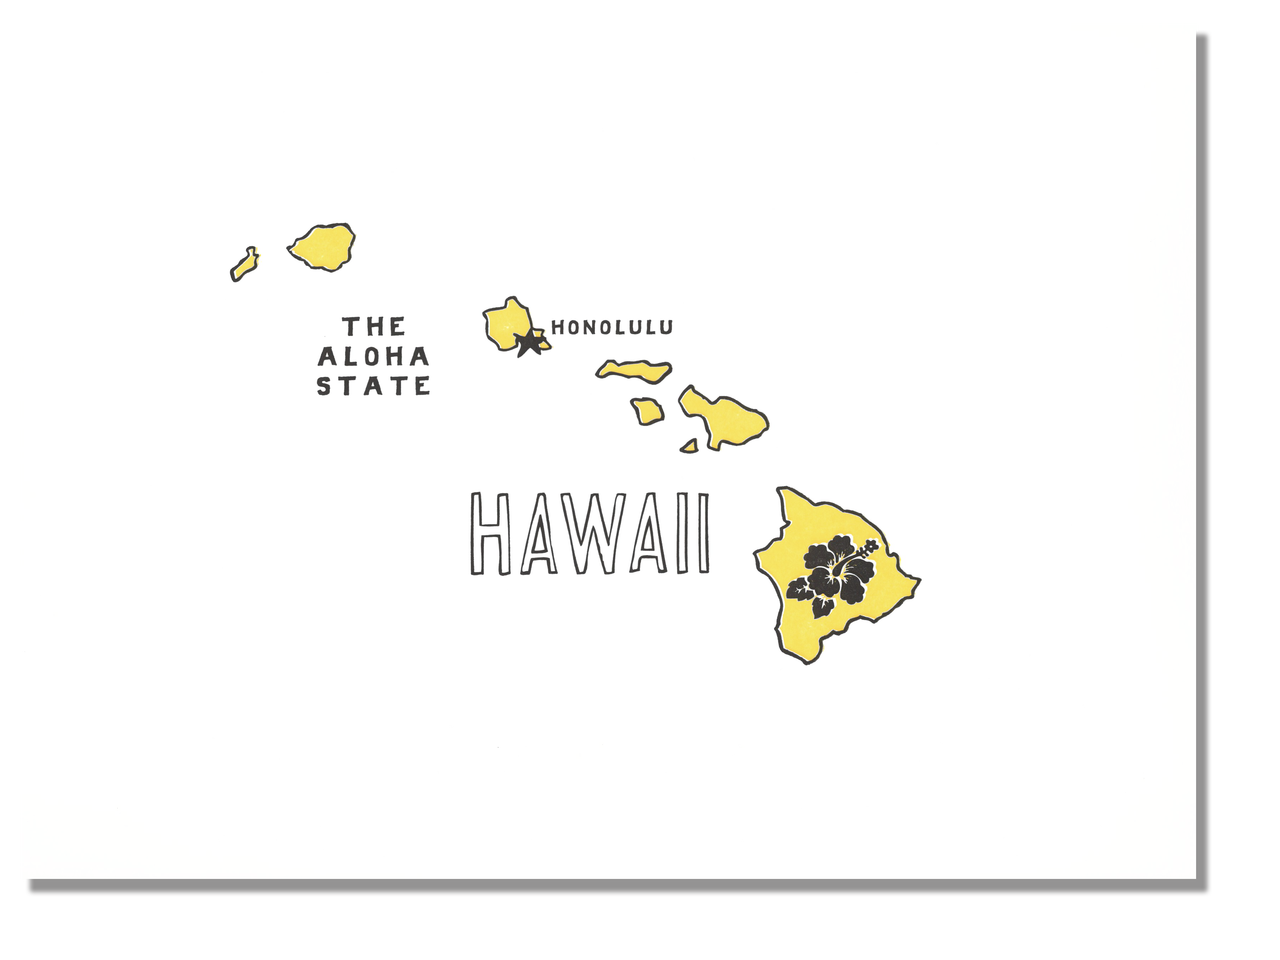 Hawaii State Print: The Aloha State